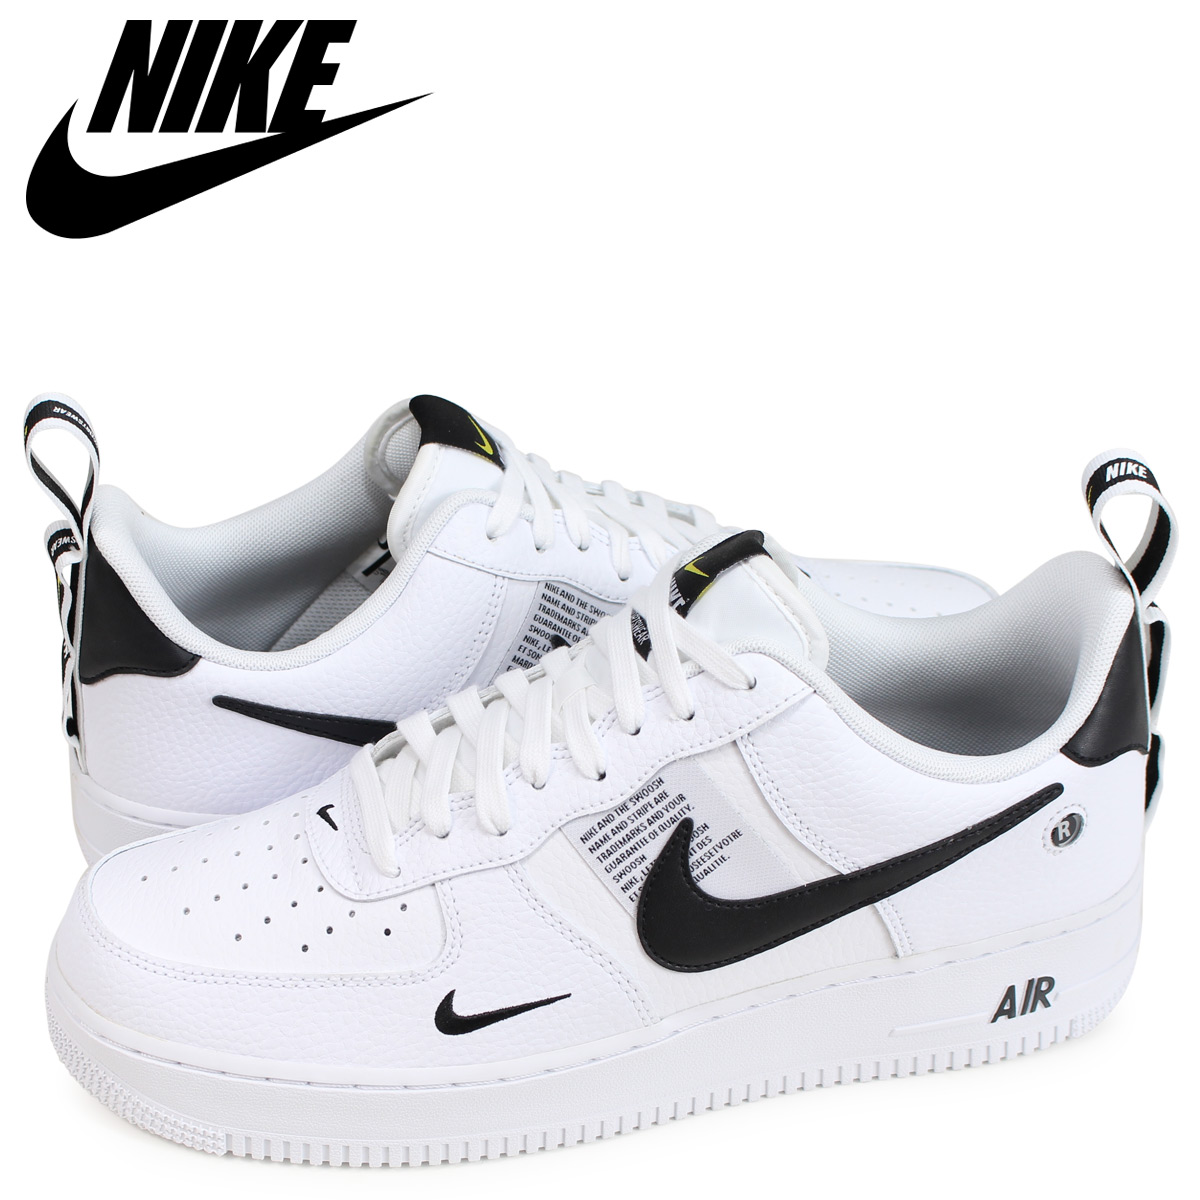 Nike NIKE air force 1 sneakers men AIR FORCE 1 07 LV8 UTILITY white AJ7747 100